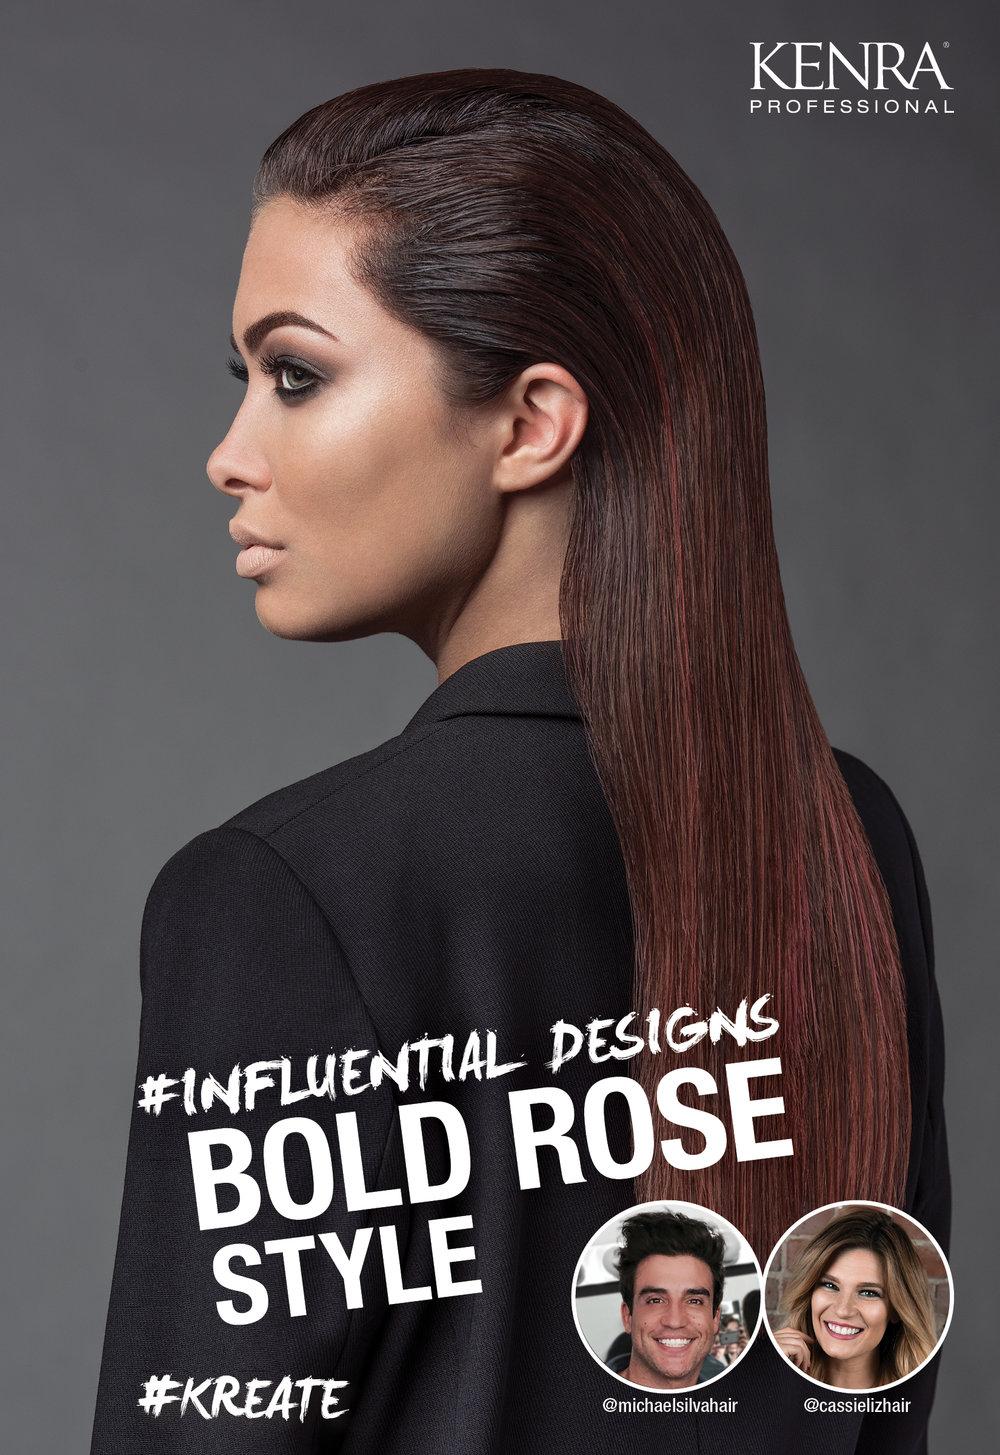 #99470-1_ID_BoldRose_Style_Sleek_web.jpg